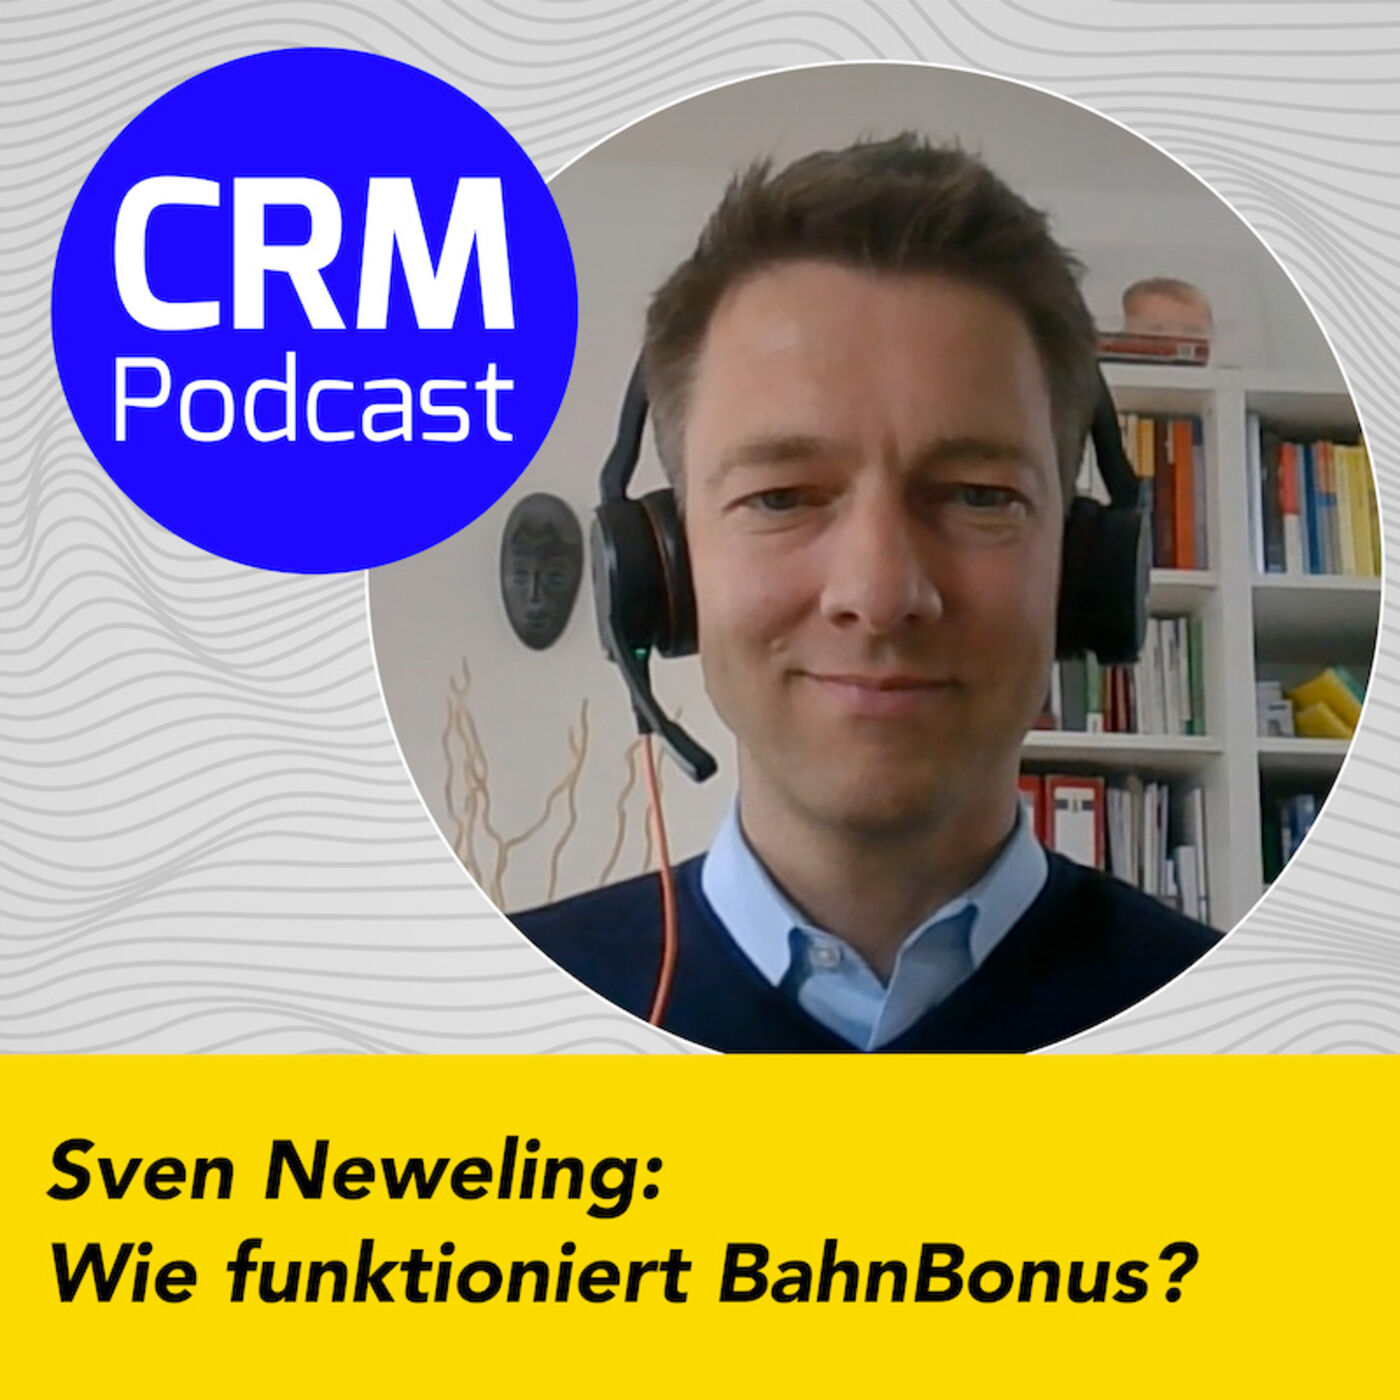 (#11) Sven Neweling: Wie funktioniert BahnBonus?